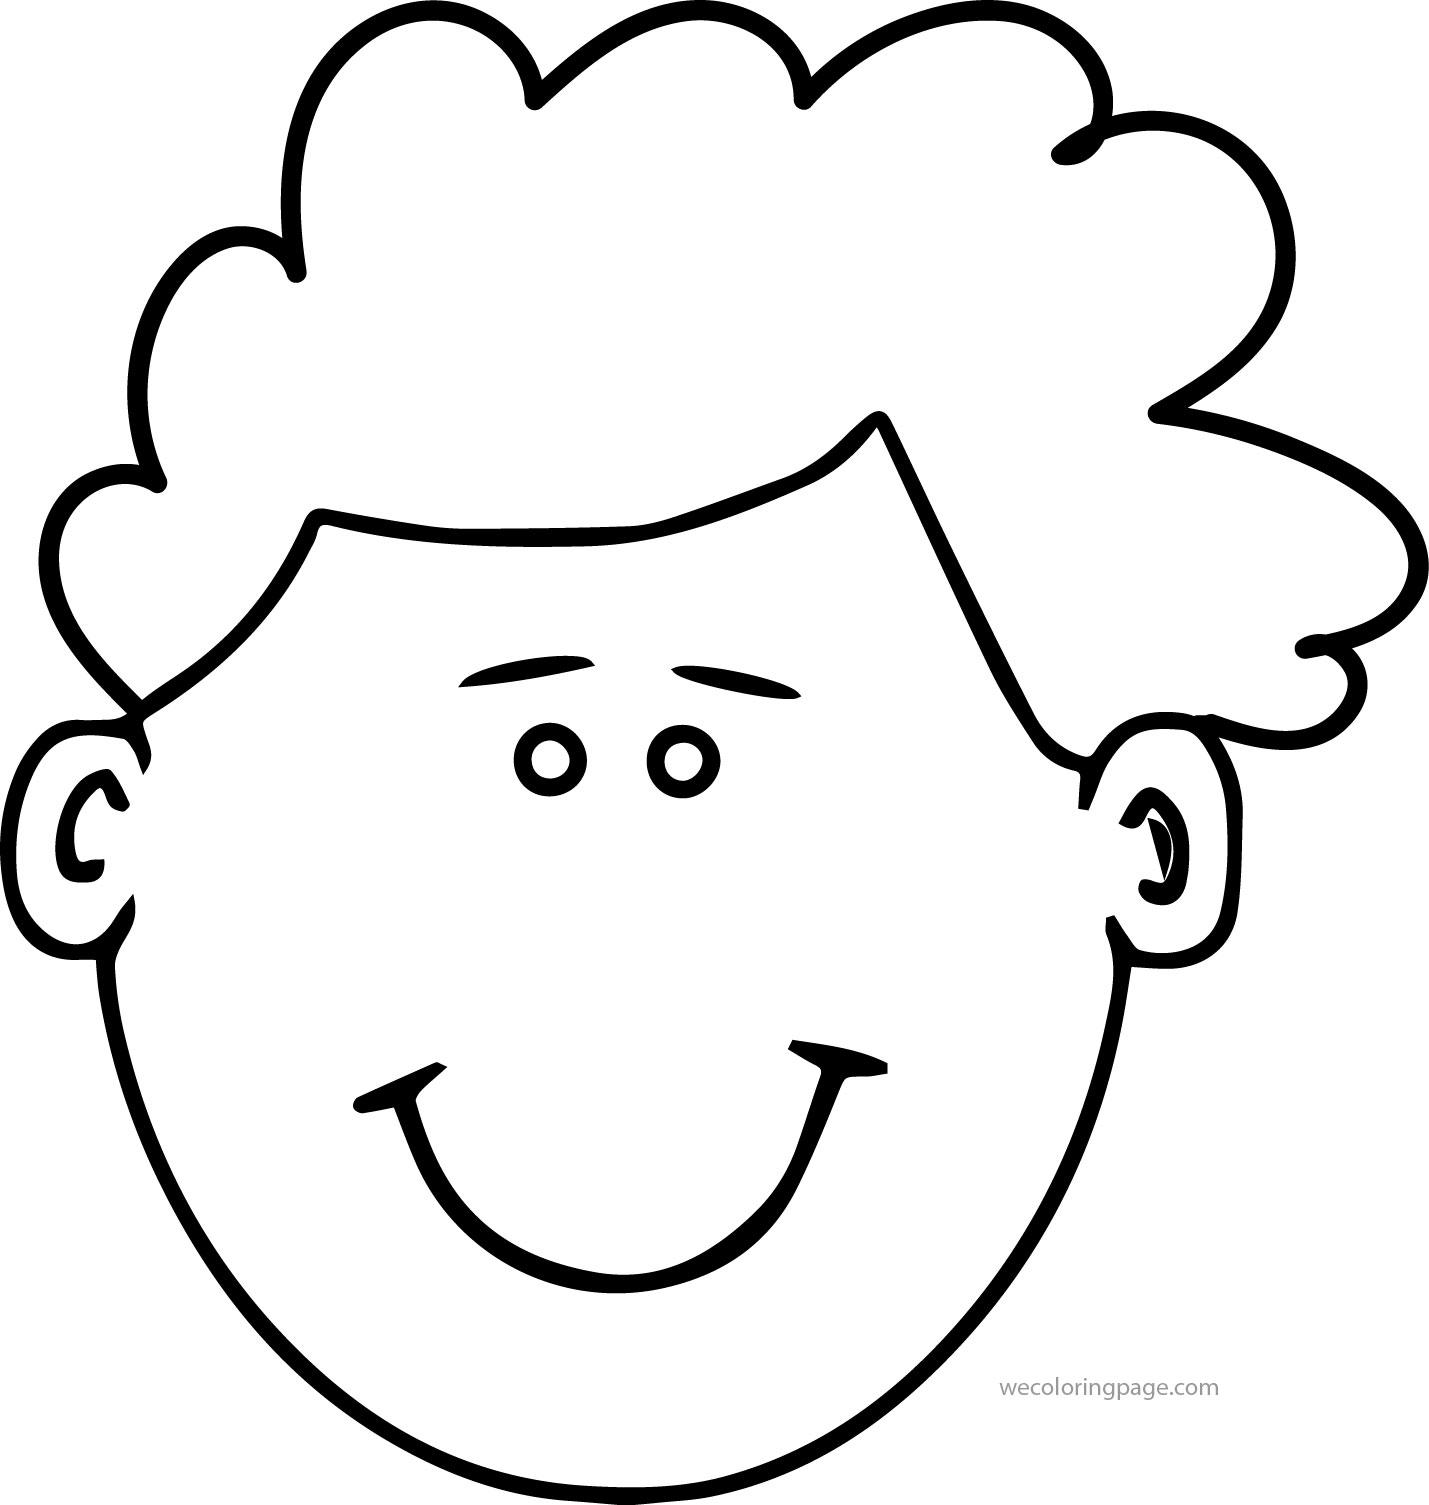 Smiling Faces Drawing At Getdrawings